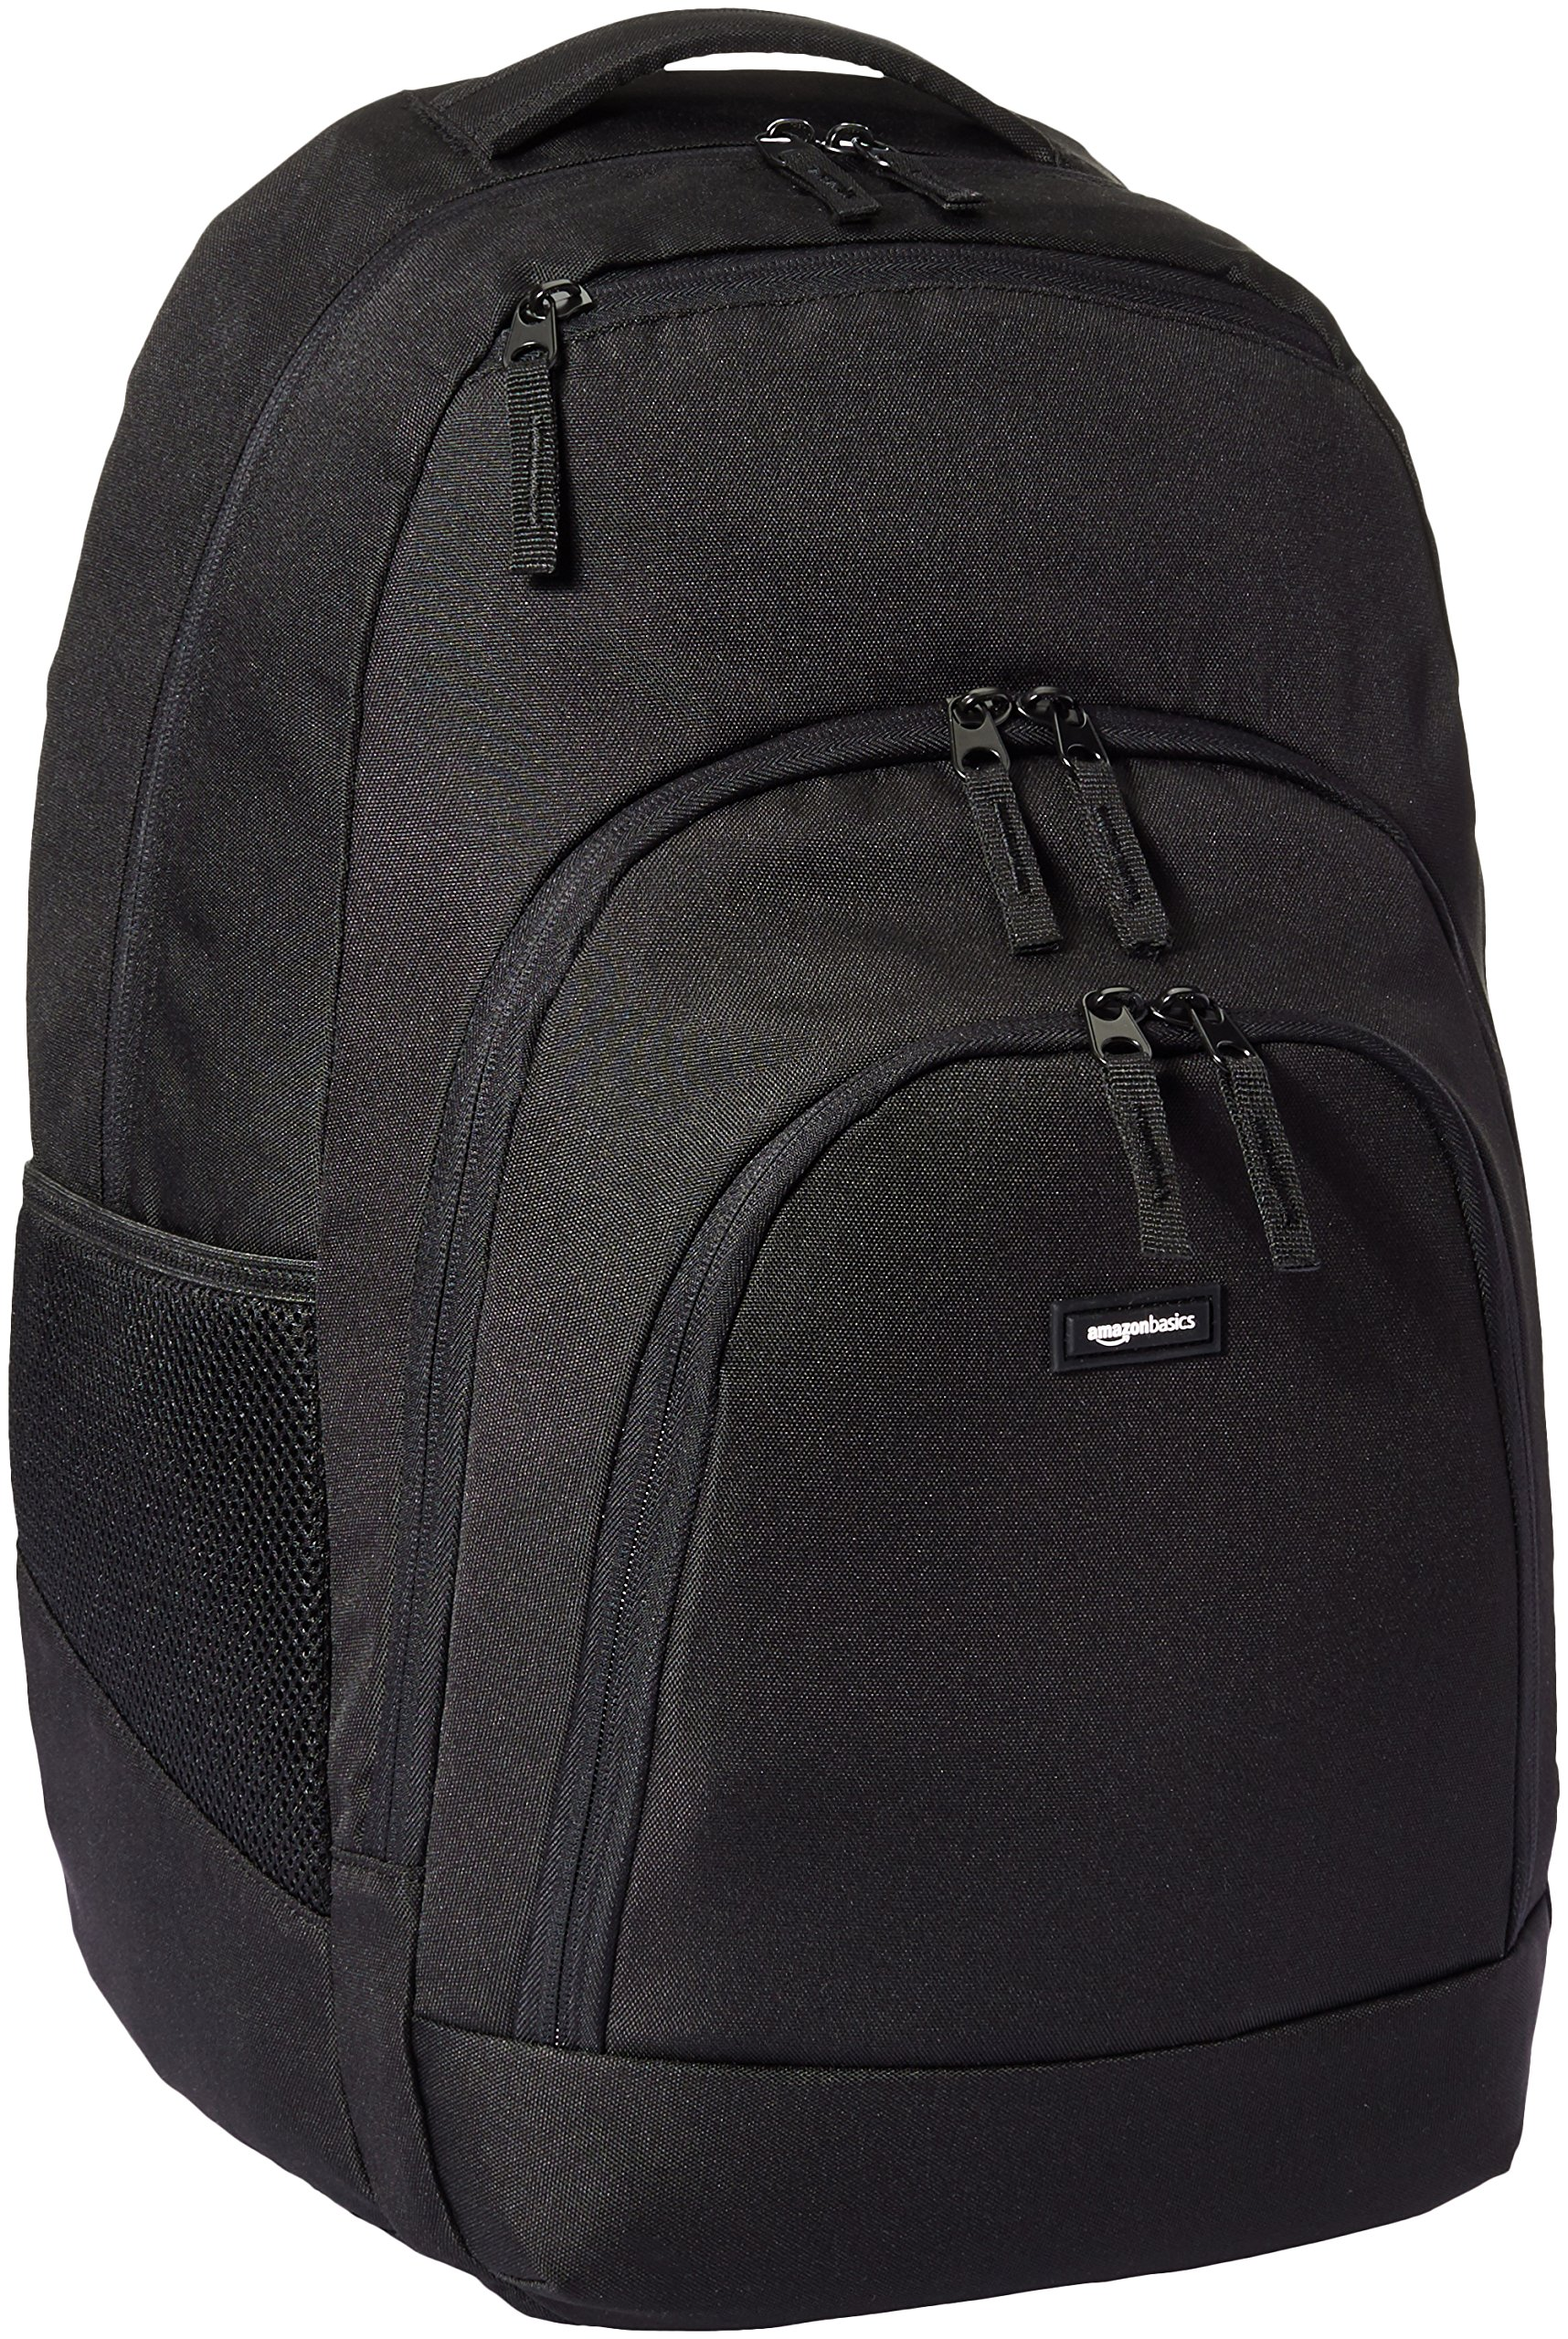 AmazonBasics Campus Backpack, Black